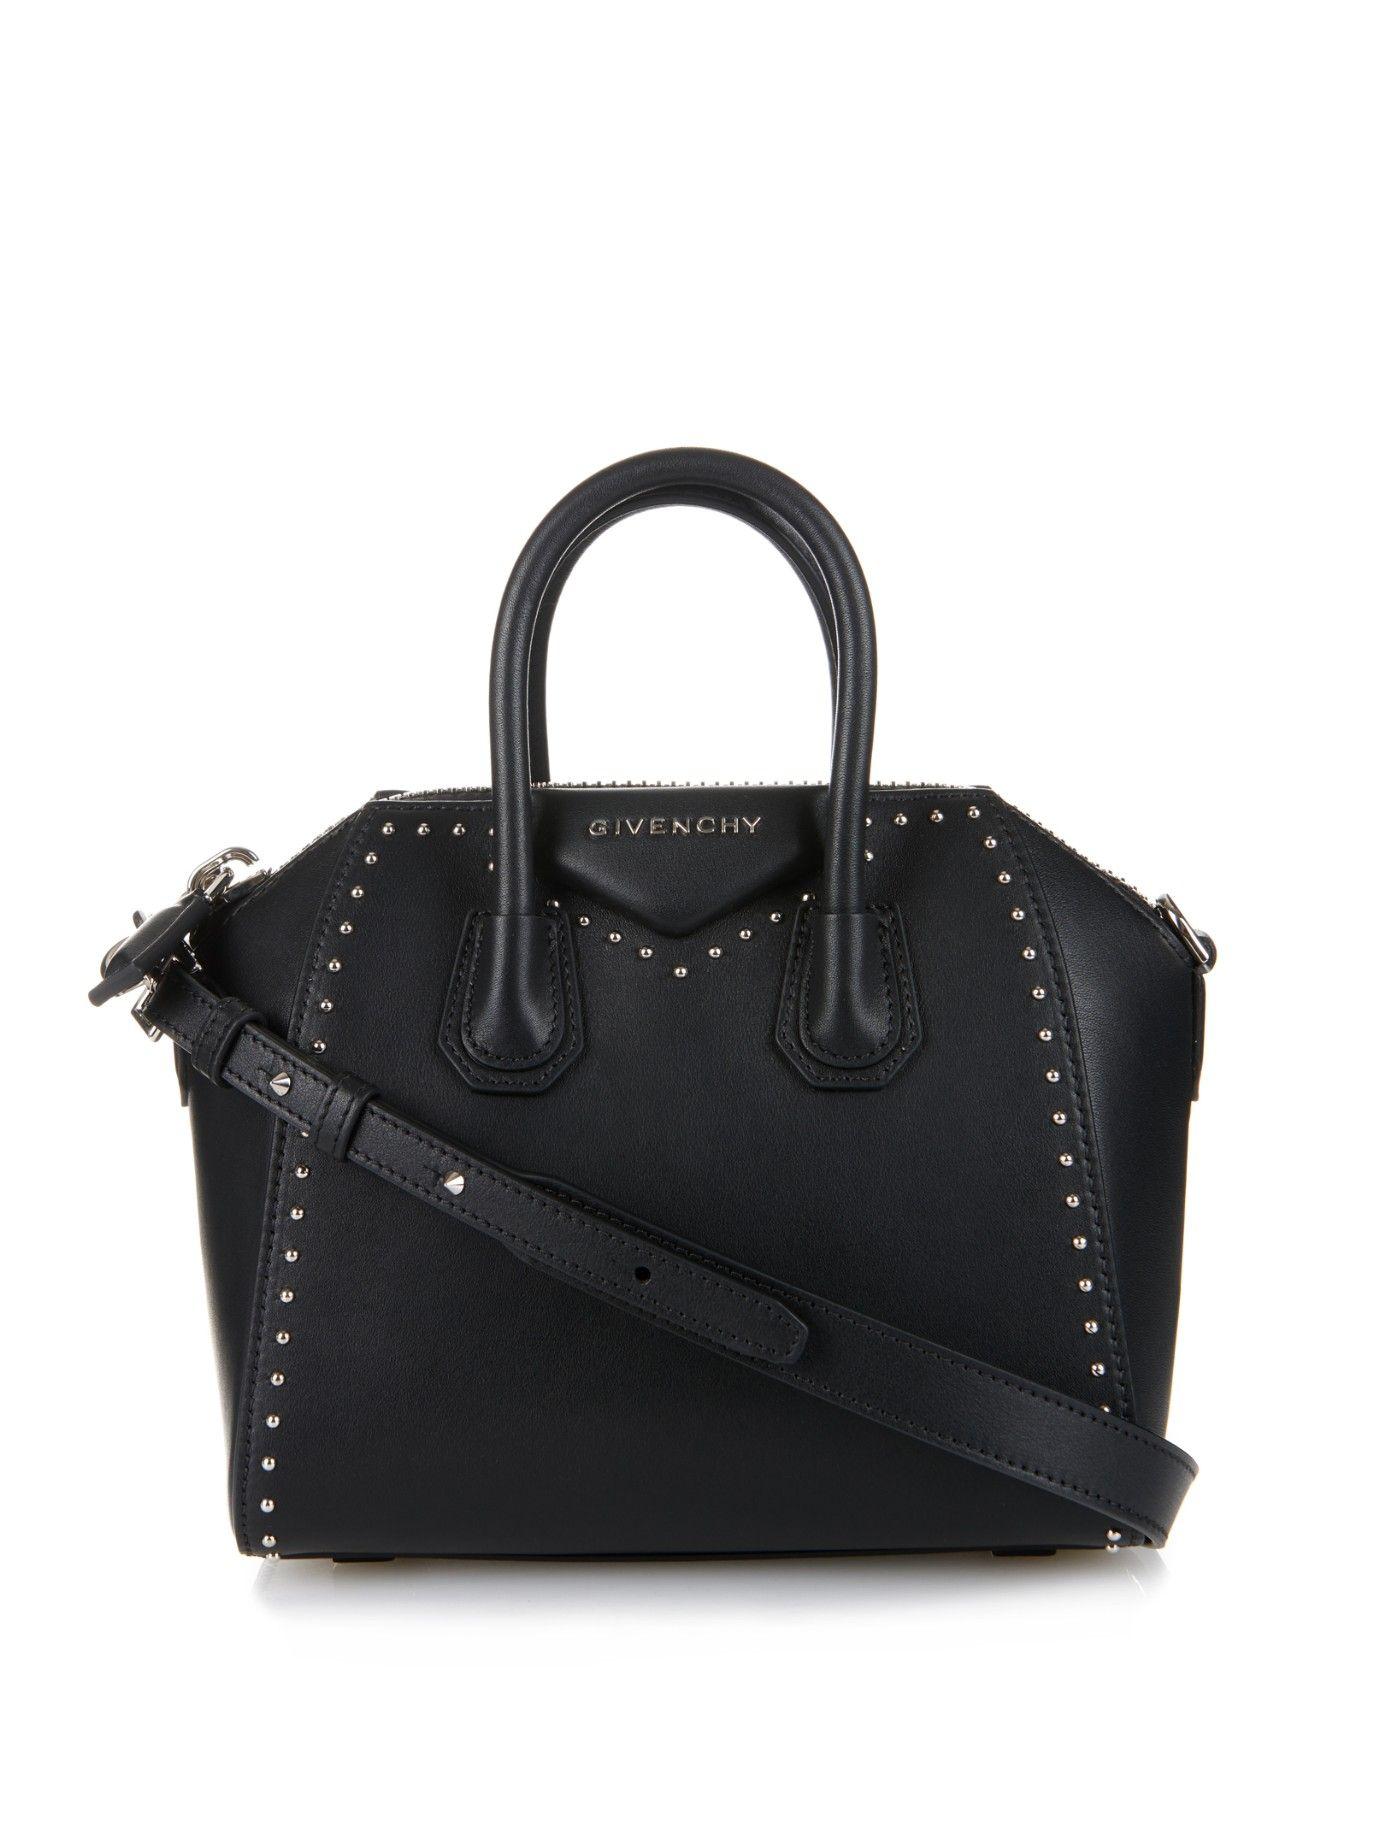 Antigona mini leather cross-body bag   Givenchy   MATCHESFASHION.COM UK